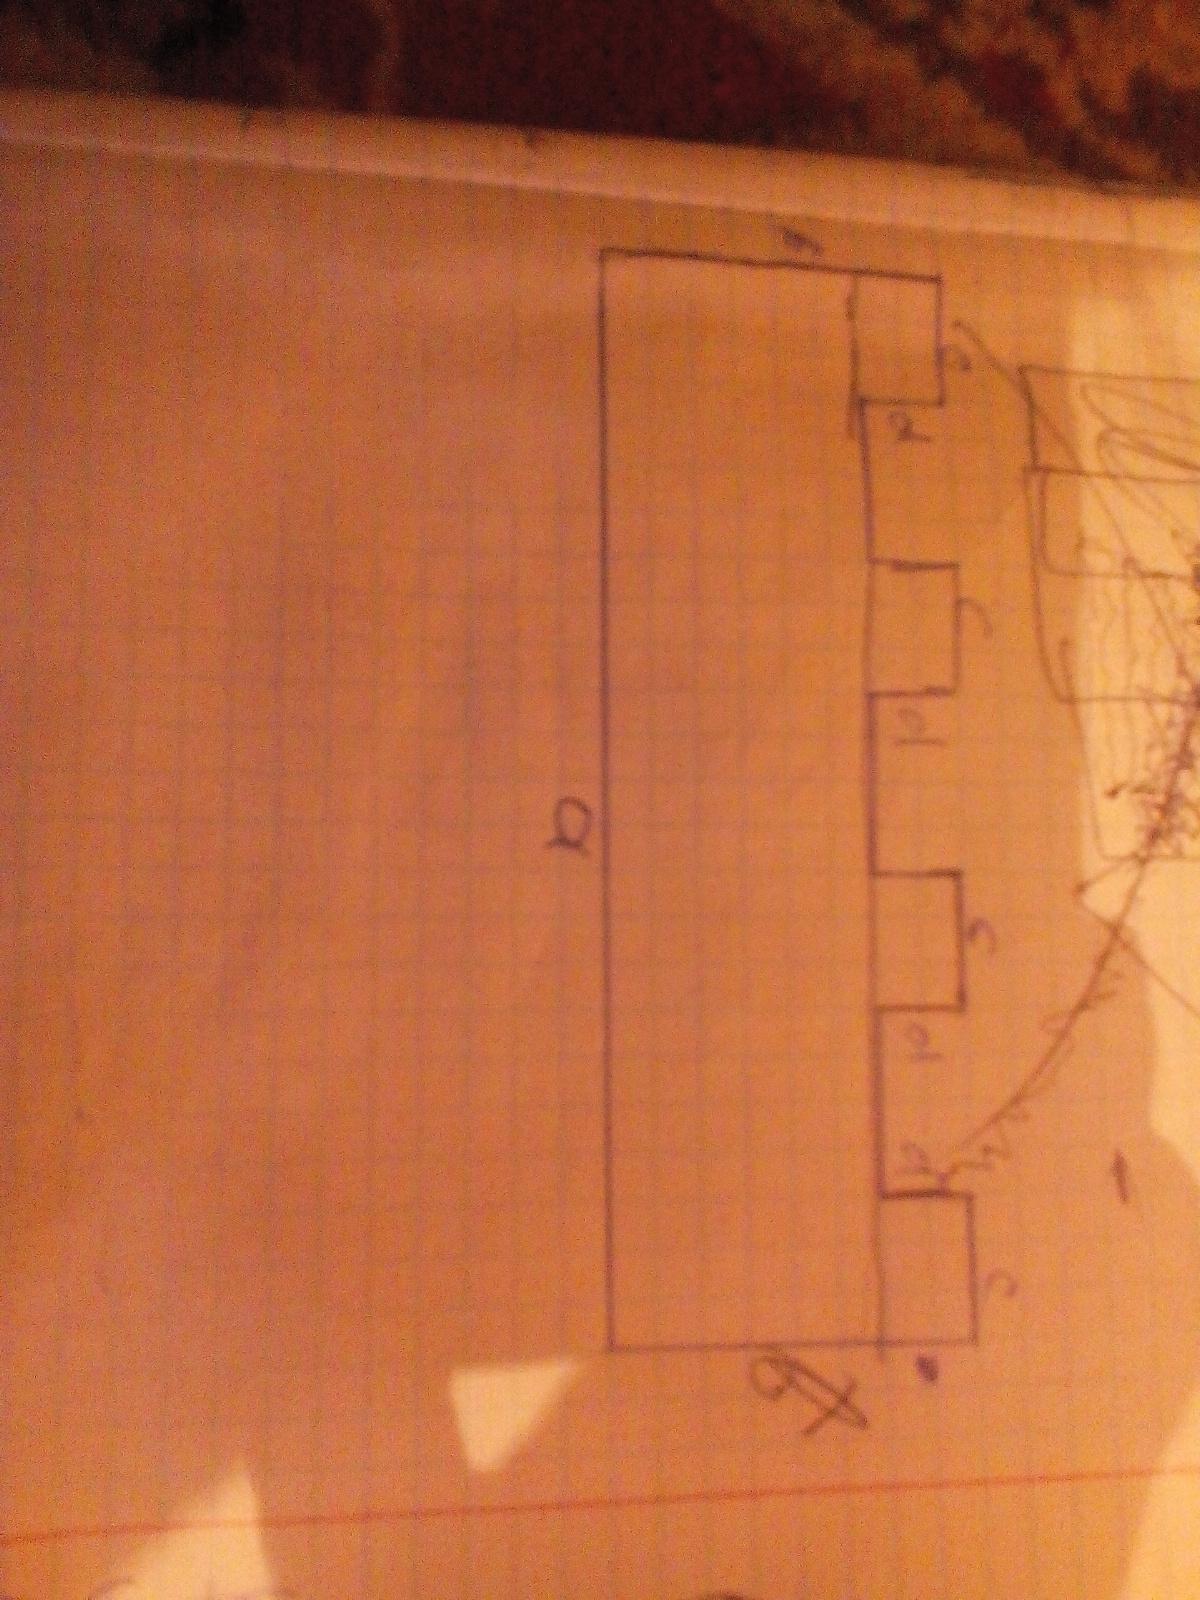 Математика для блондинок Объем прямоугольного параллелепипеда